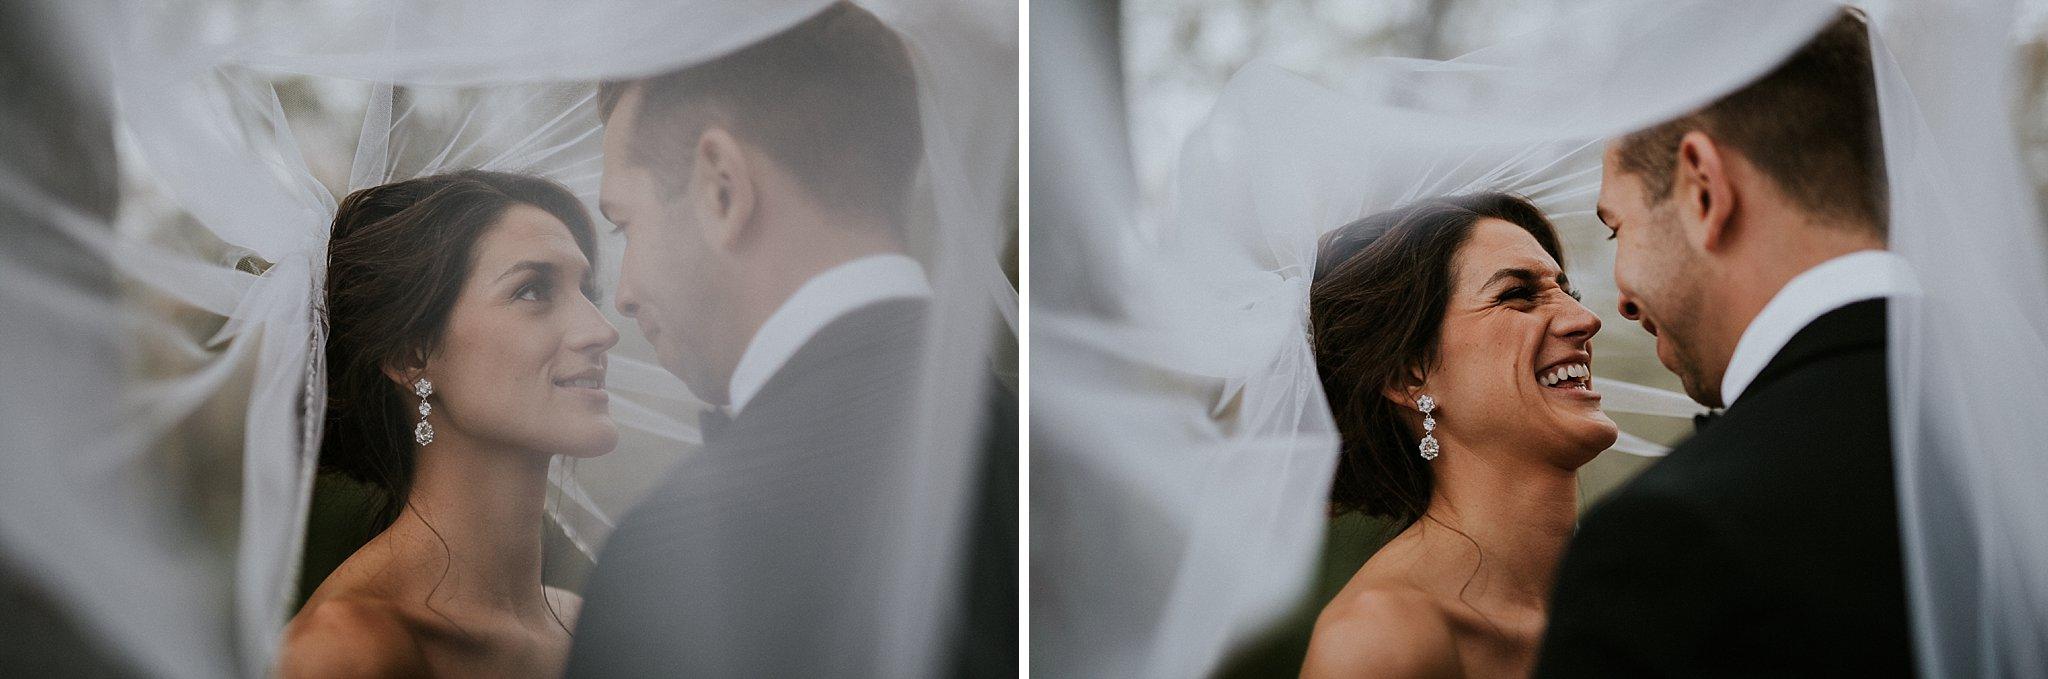 Matt-Lauren_St-Marys_Hilton-City-Center-Milwaukee-Wedding_liller-photo_0045.jpg